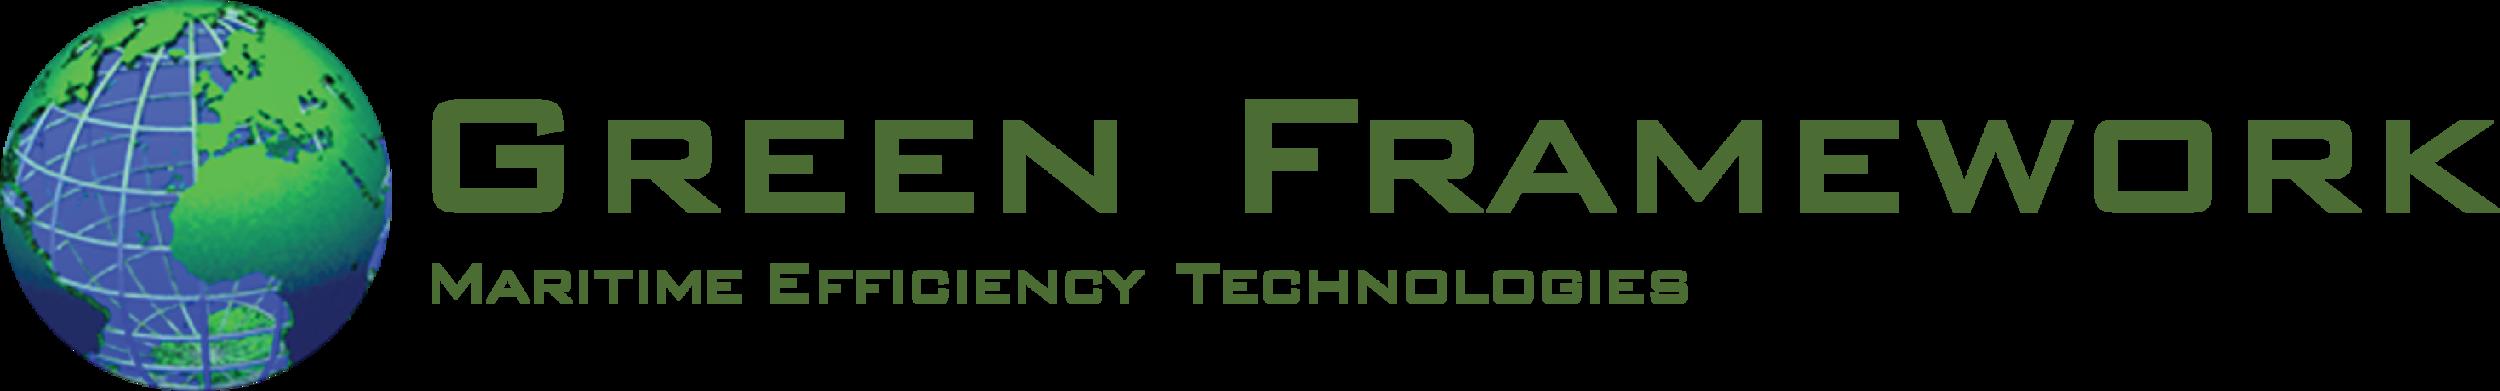 Green_Framework.png